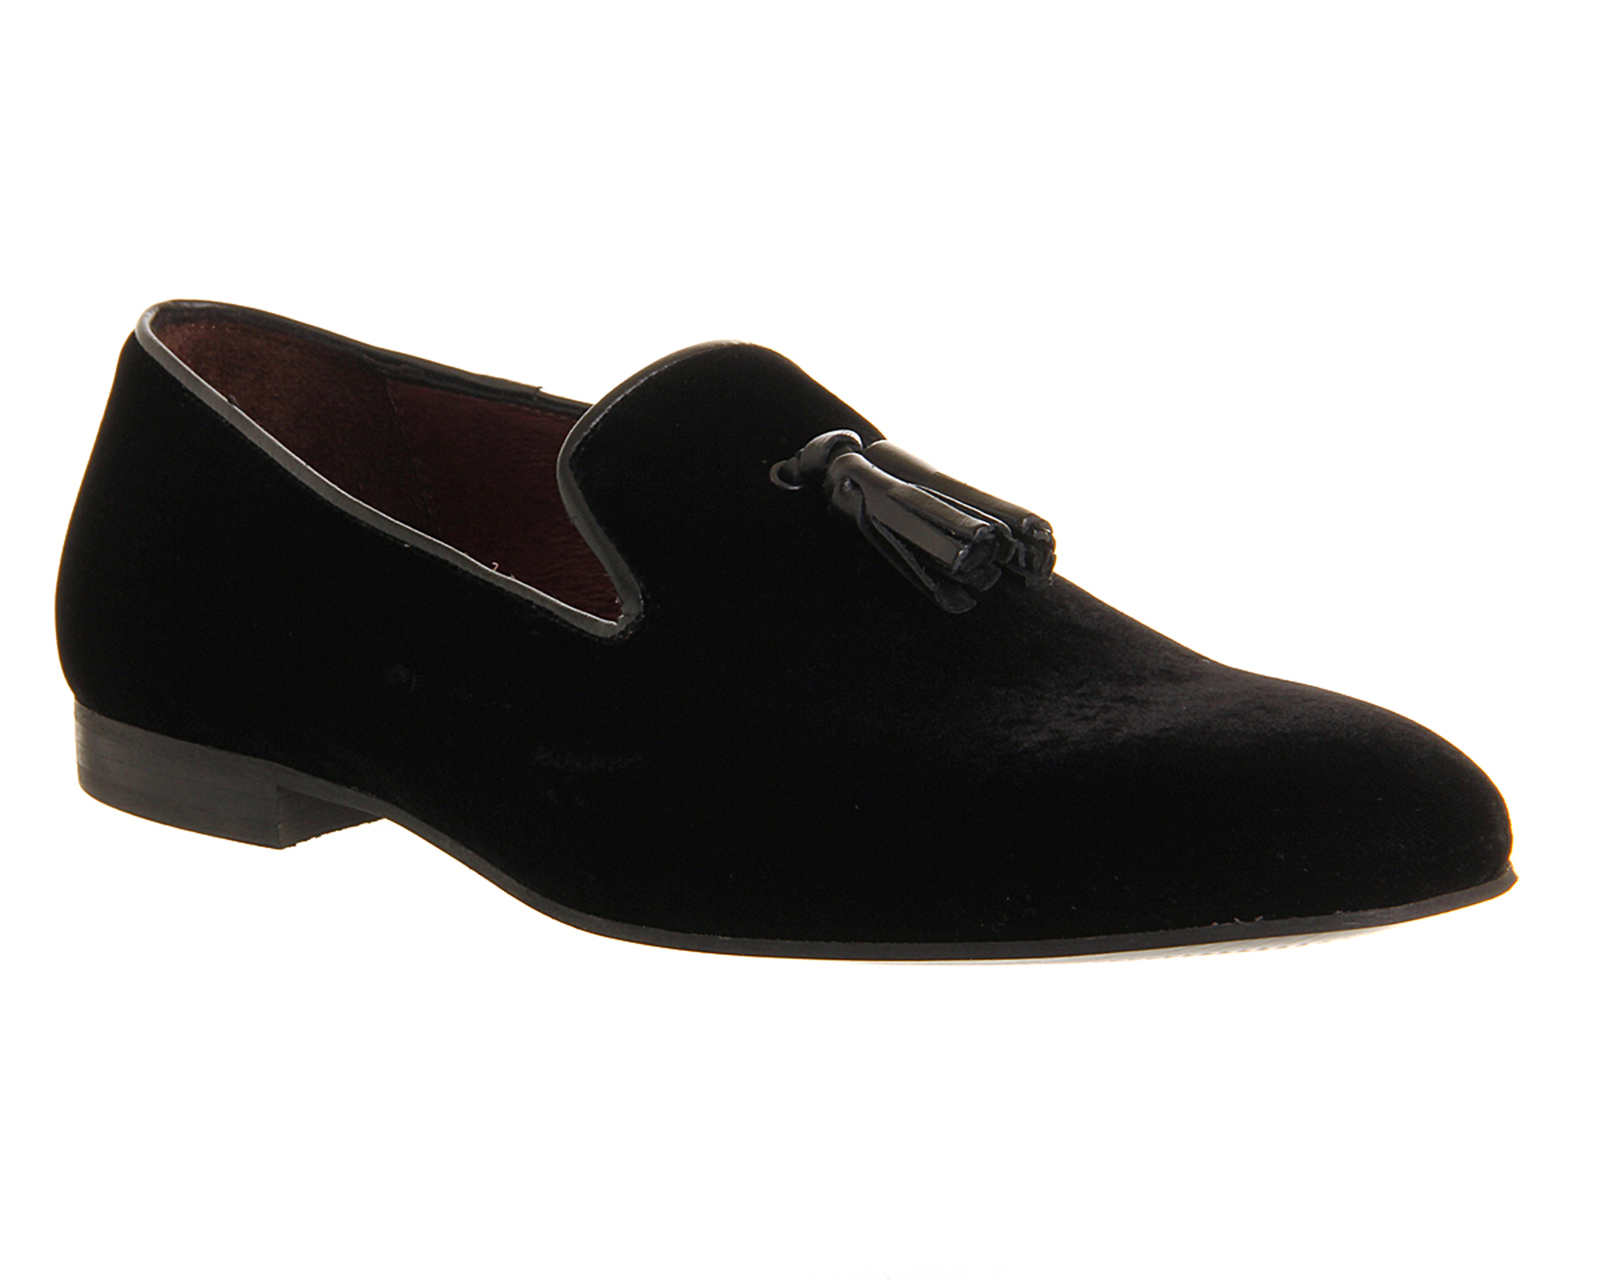 Mens Poste Aristocrat Loafers BLACK VELVET Formal Shoes | eBay